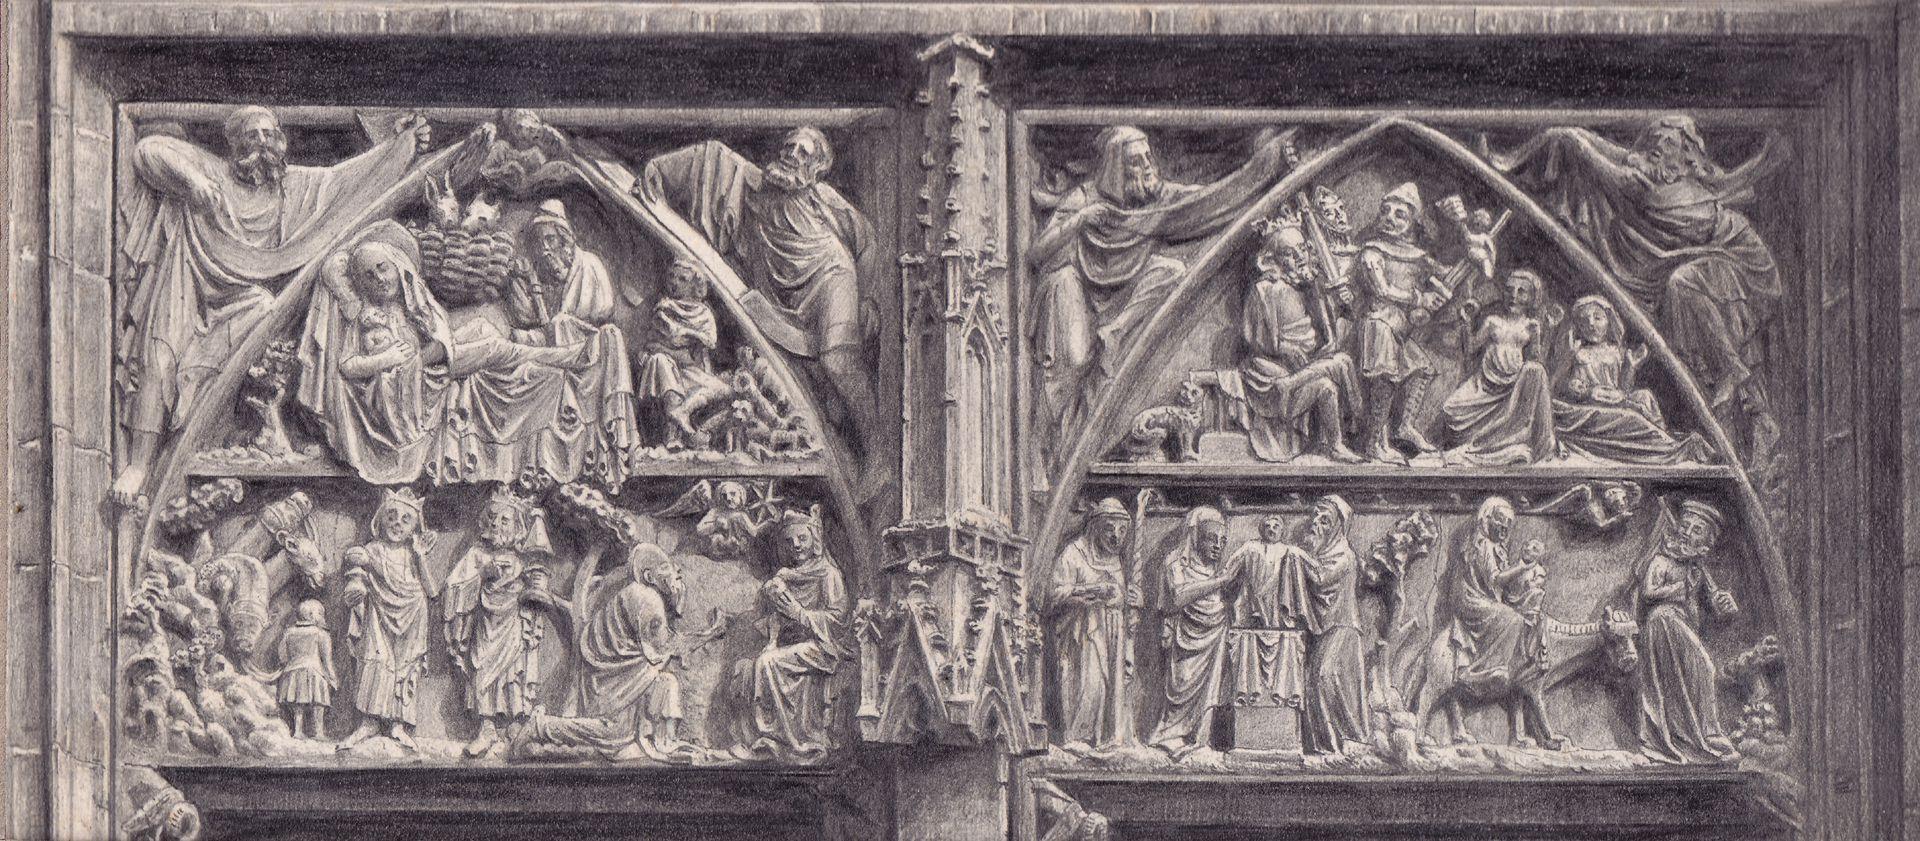 Tympanum register of the main portal of St. Lorenz Church , St. Lorenz Church, Tympanum register of the main portal